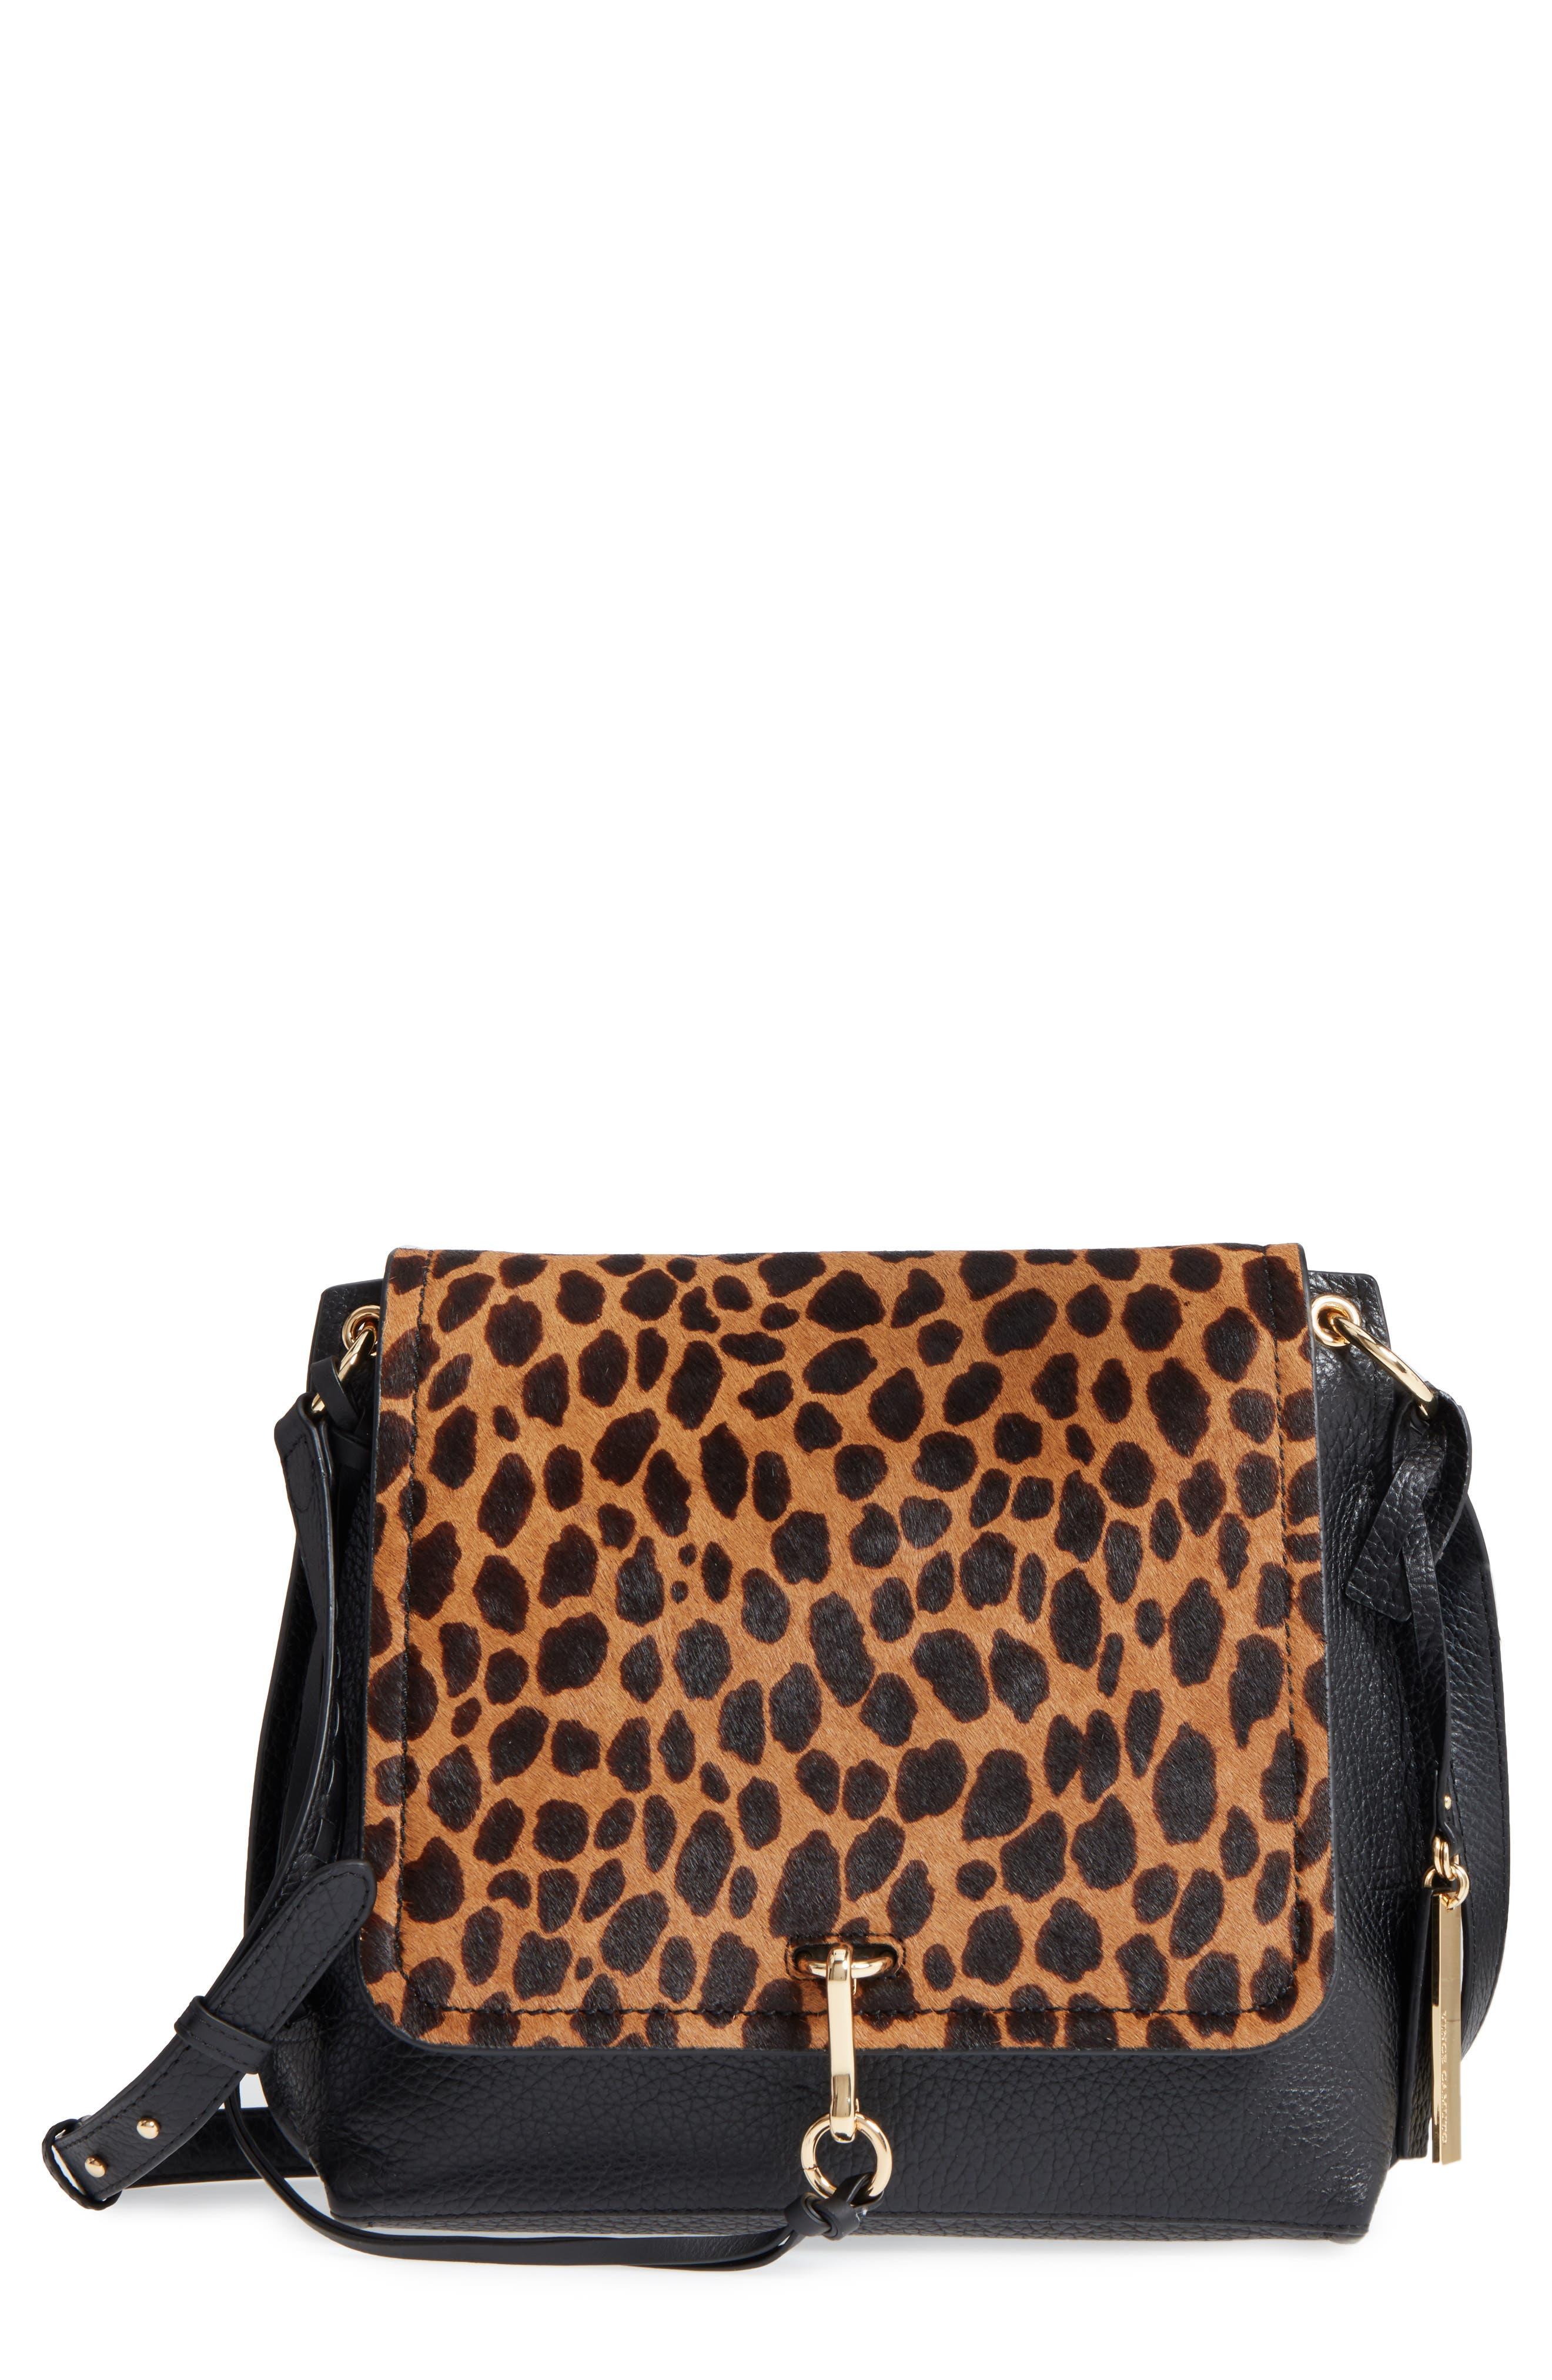 Vince Camuto Blena Leather & Genuine Calf Hair Crossbody Bag